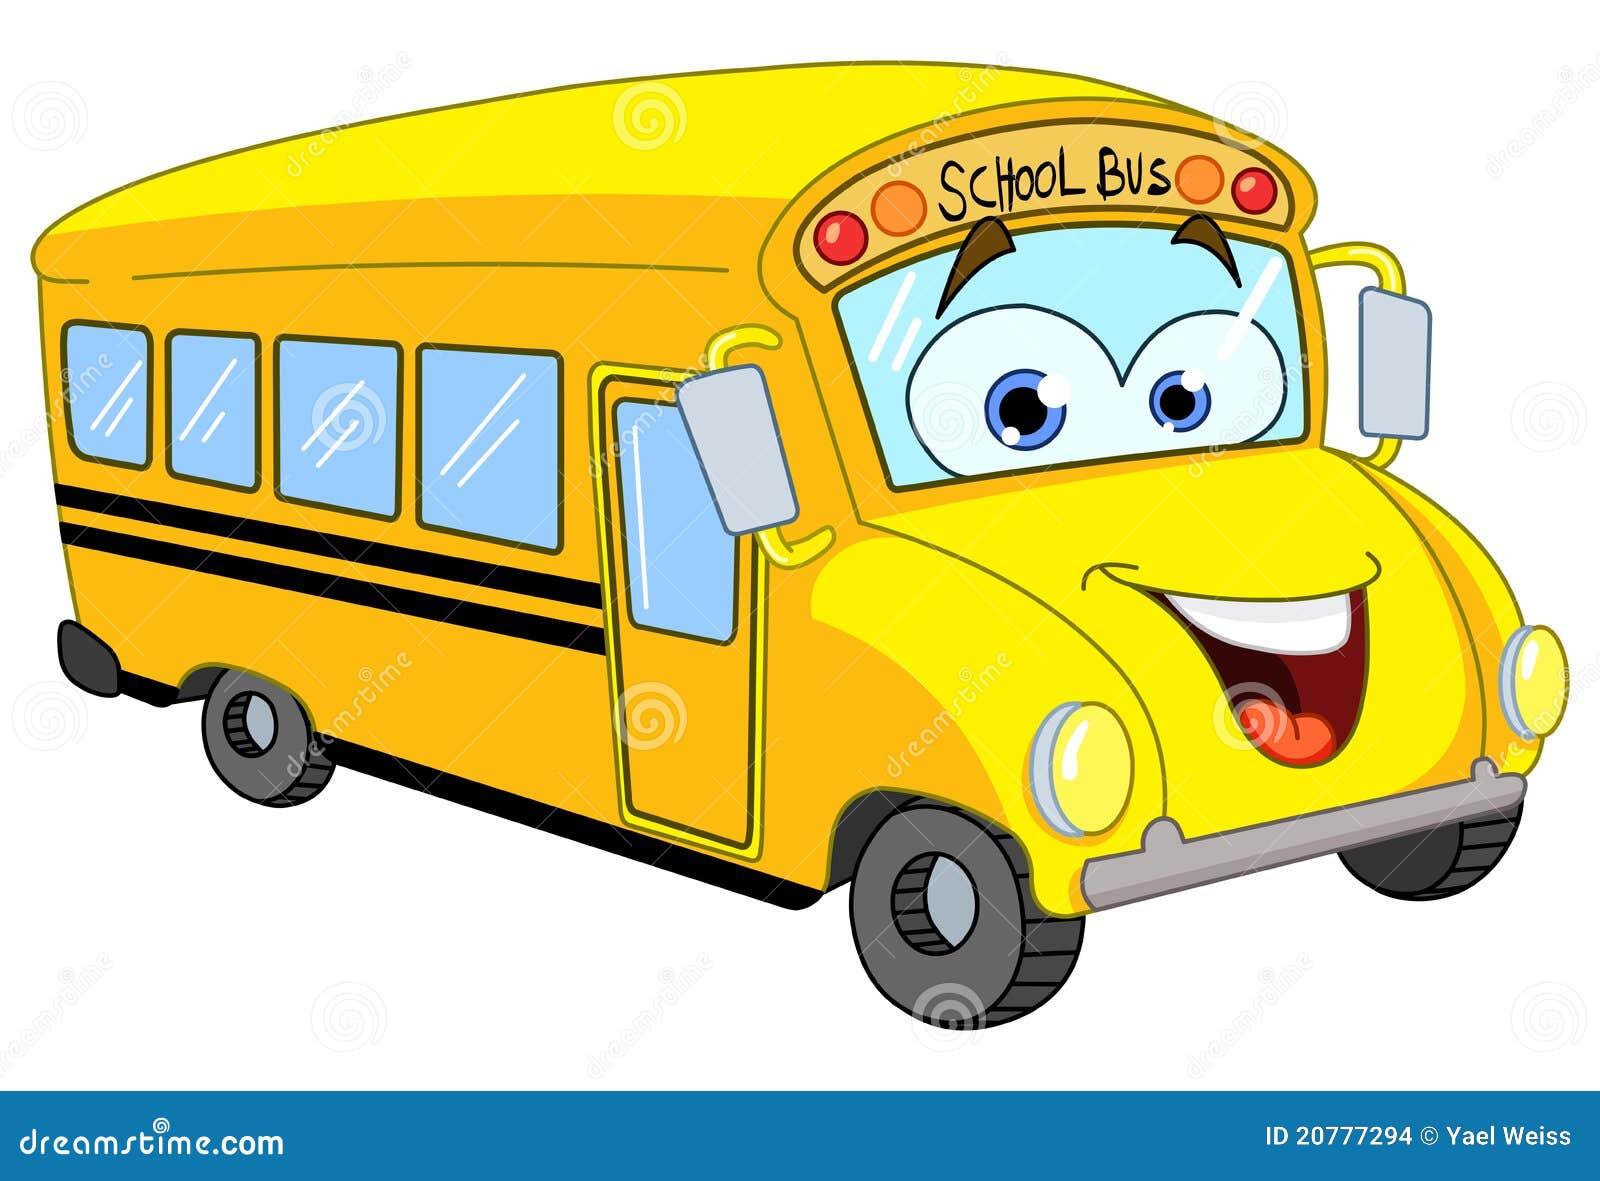 Cartoon School Bus Stock Images - Image: 20777294